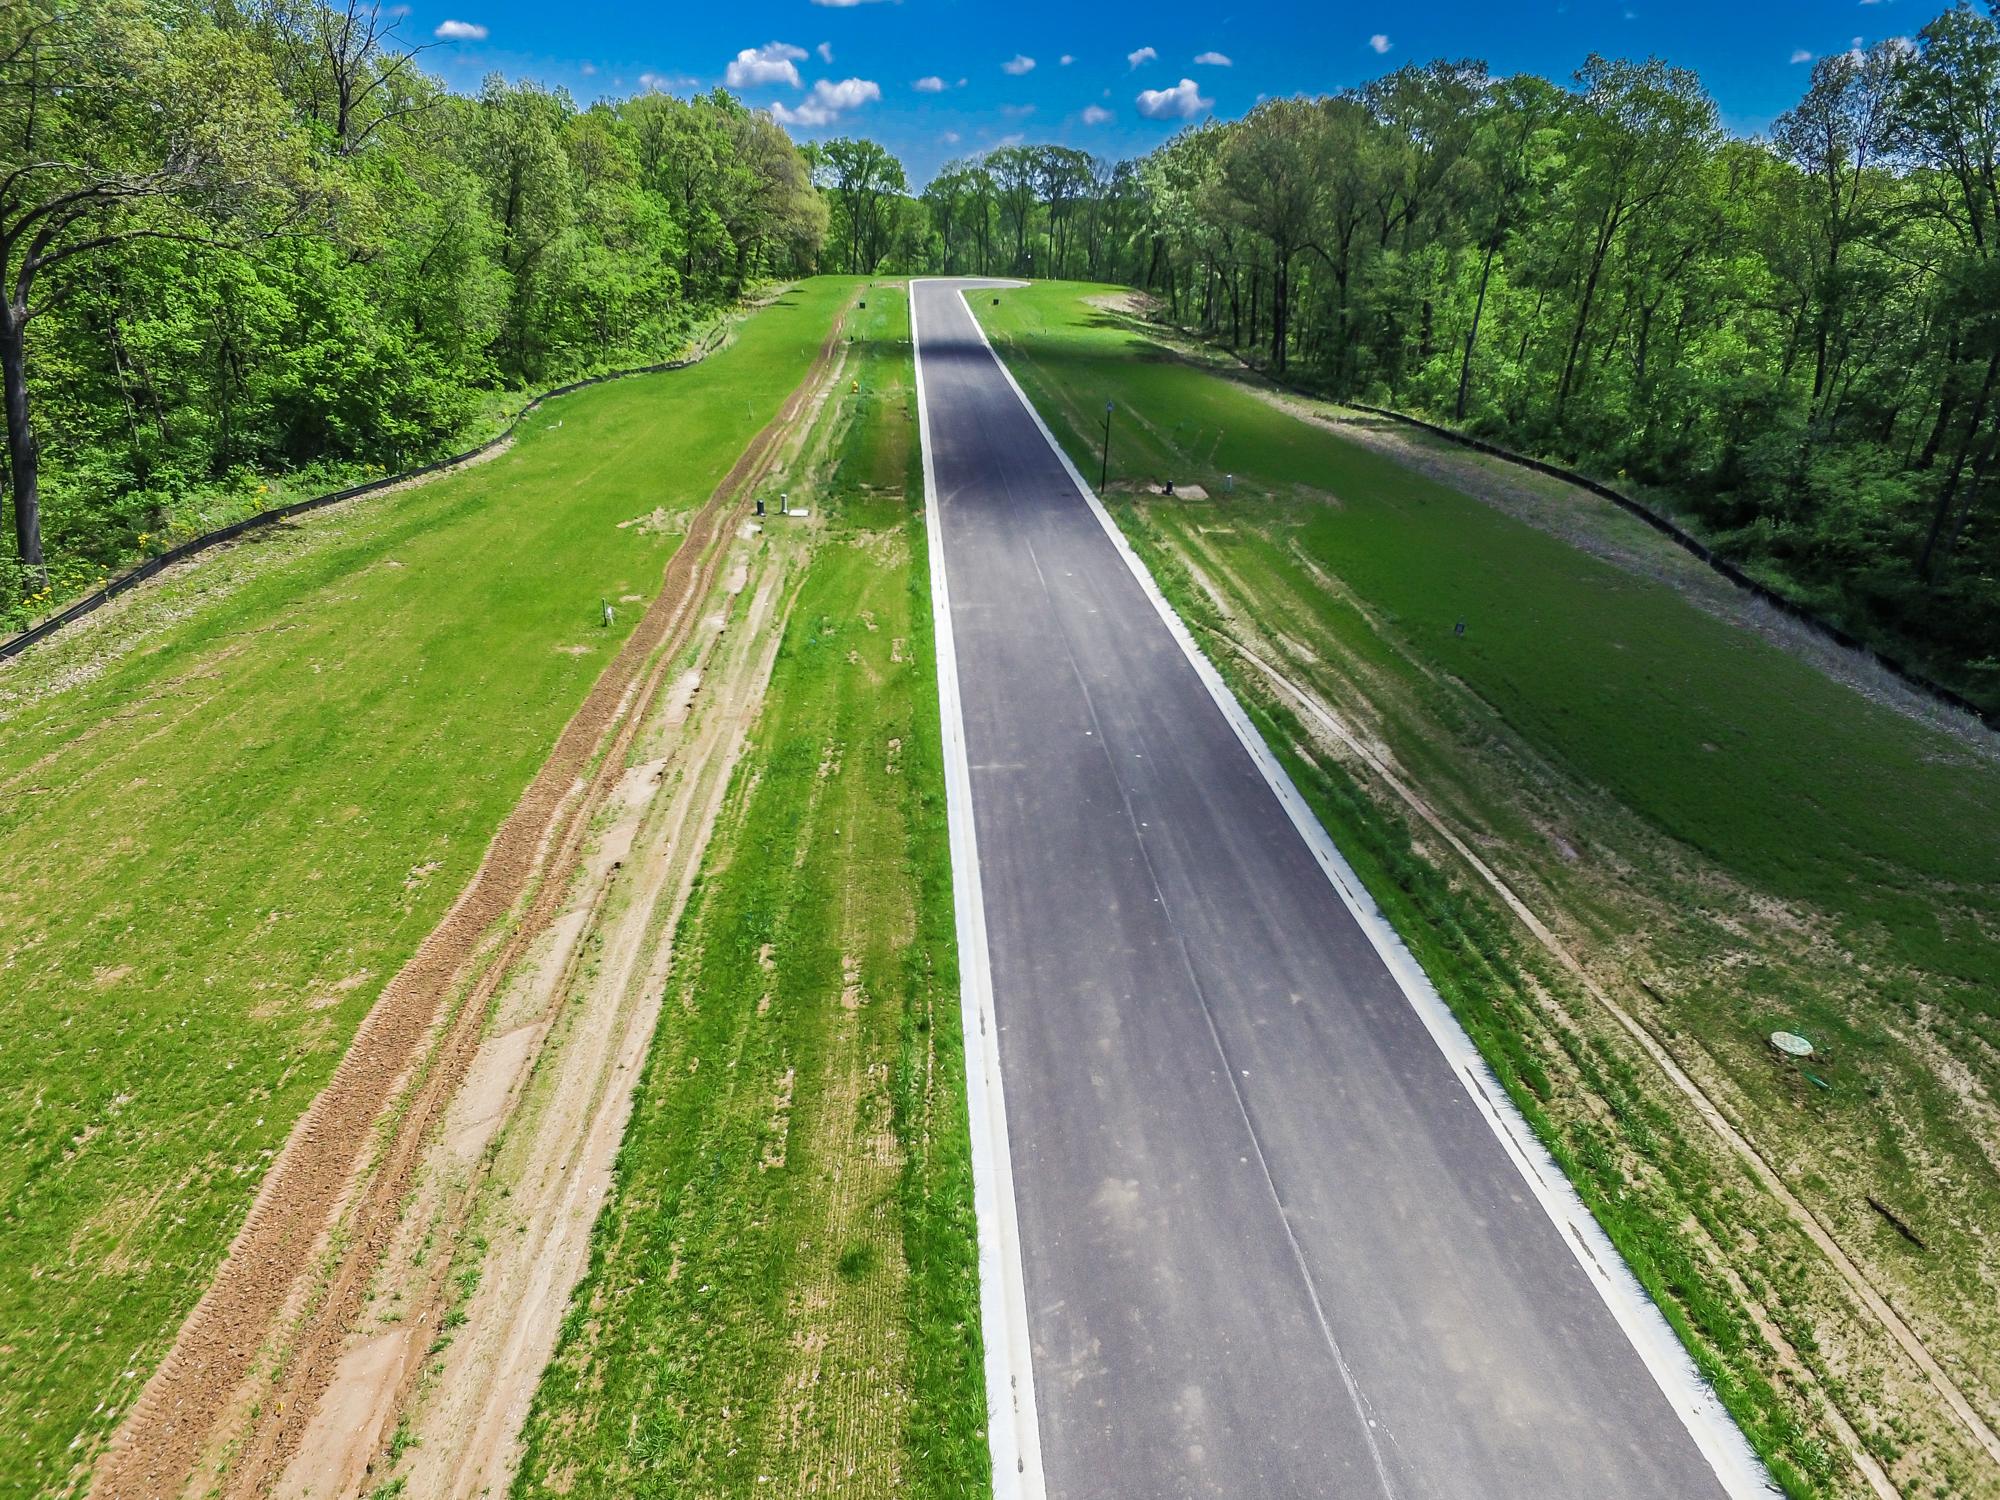 Bethel_Ridge_Farms_O'Fallon_Illinois_Aerials_Progress_5.3.17-5.jpg